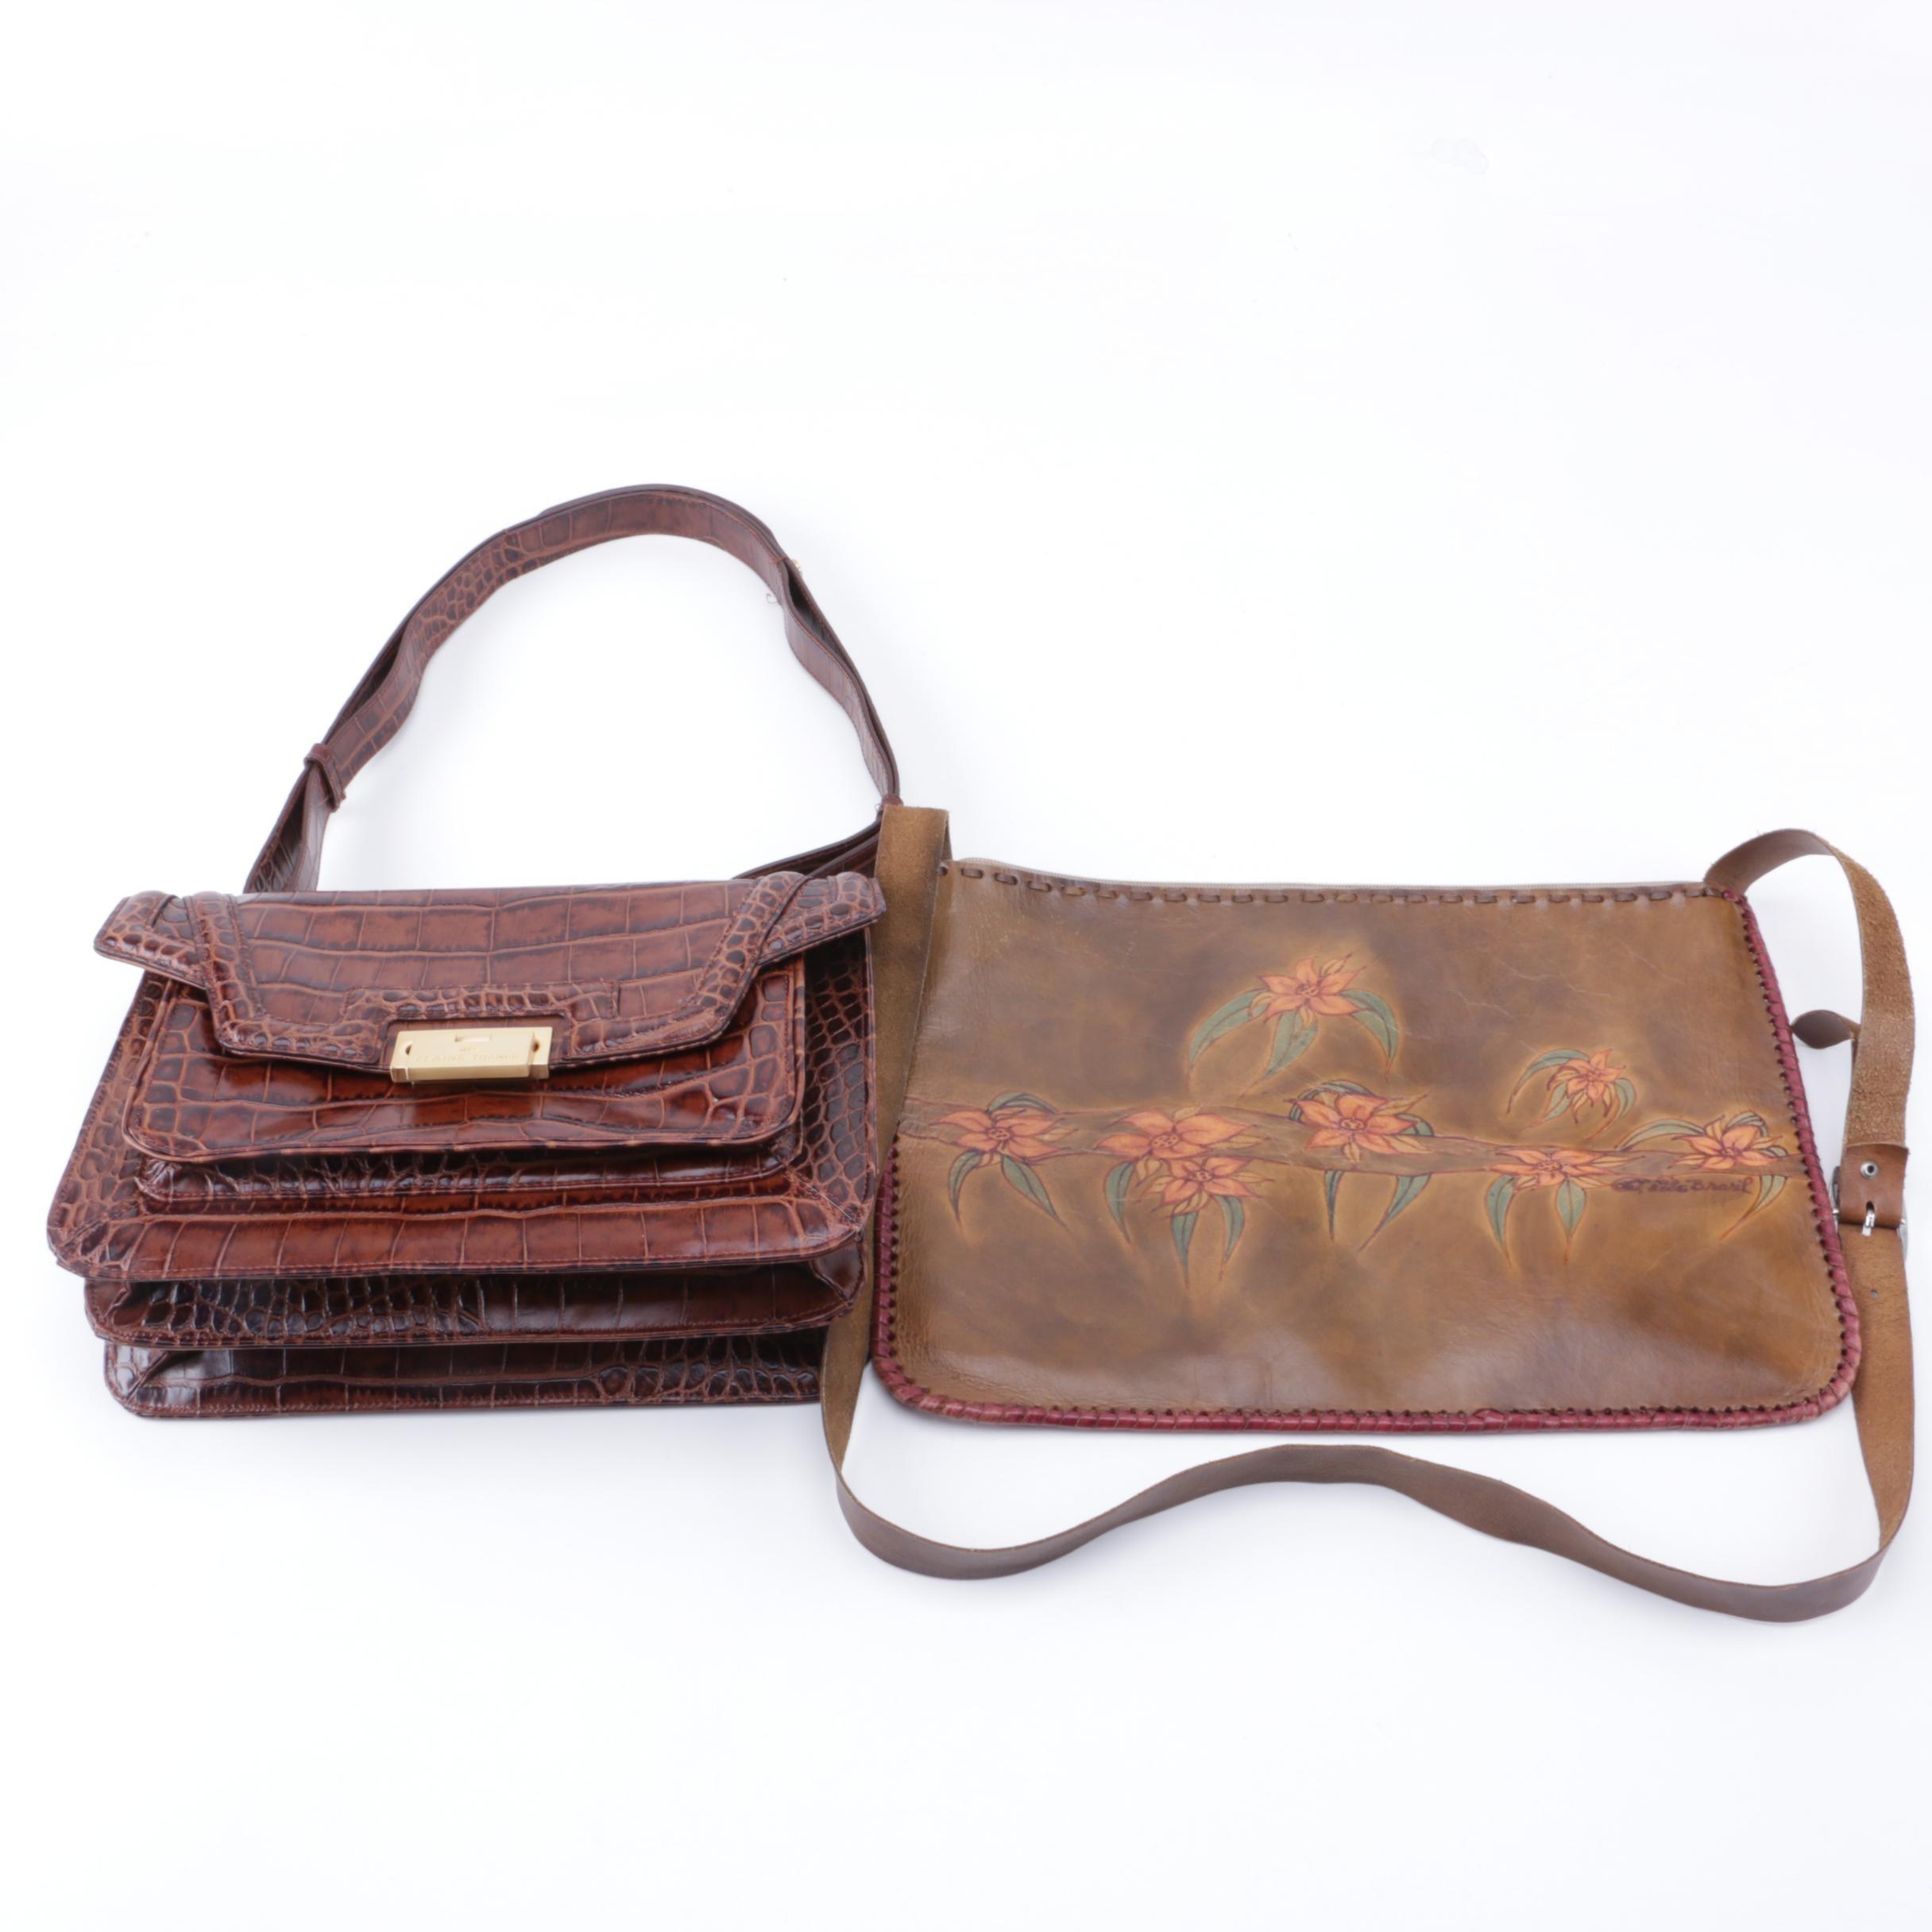 Women's Brown Leather Handbags